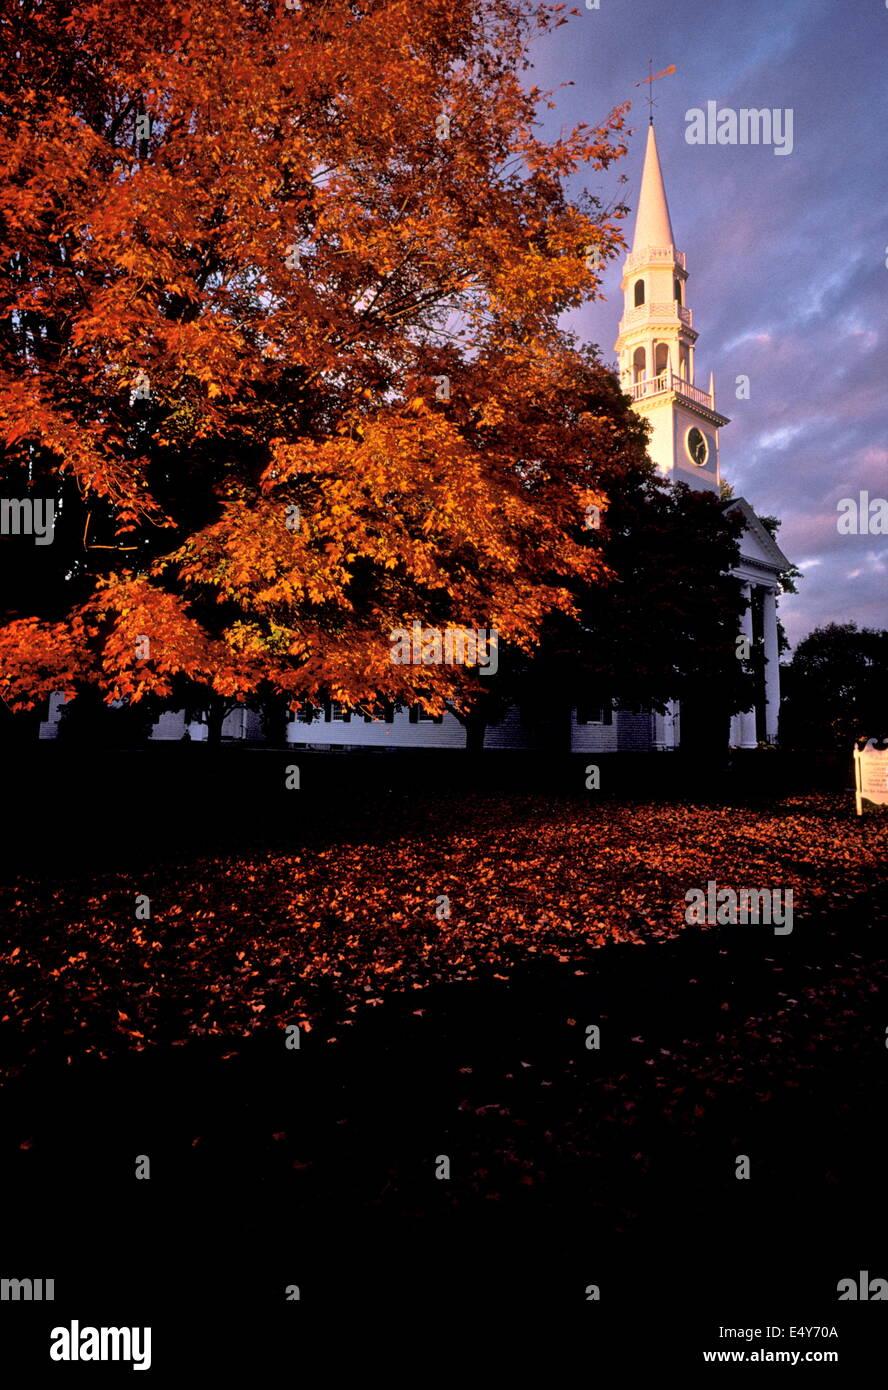 LITCHFIELD, CT. USA. FALL FOLIAGE IN LAST RAYS OF OCTOBER LIGHT.PHOTO:JONATHAN EASTLAND/AJAX - Stock Image